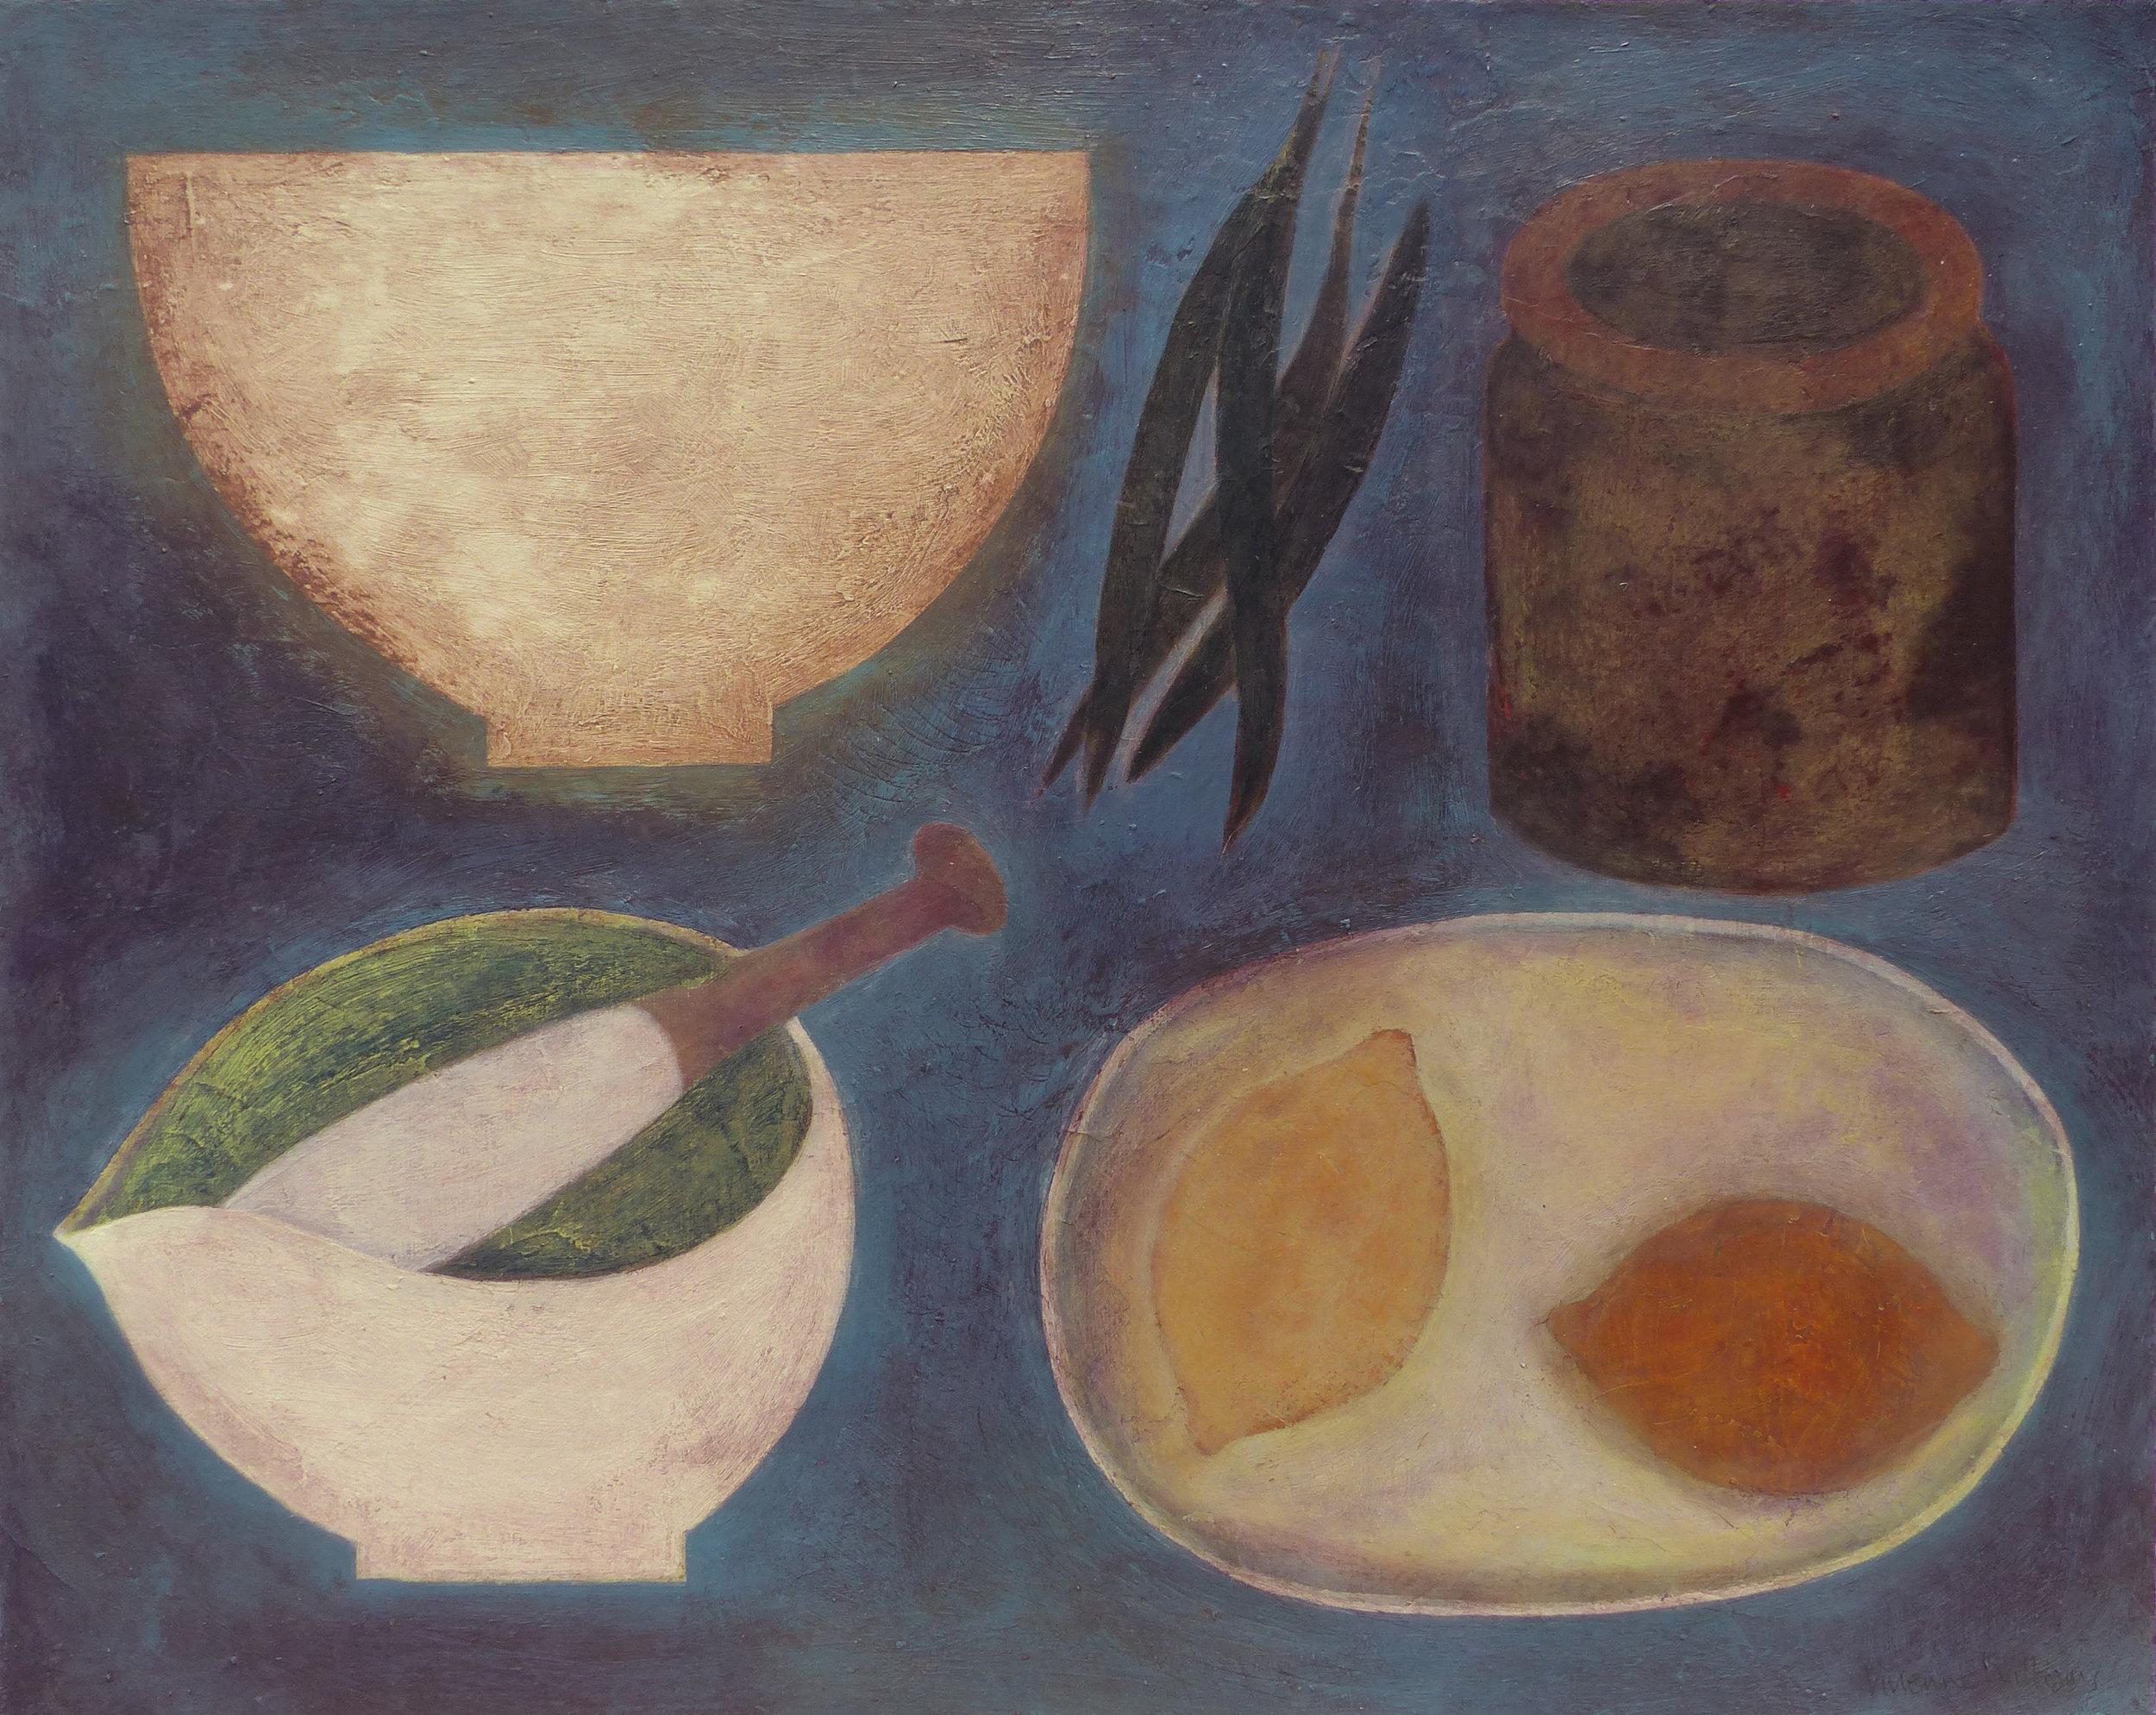 Cornish Kitchen with Lemons, 41cm x 51cm, 2018